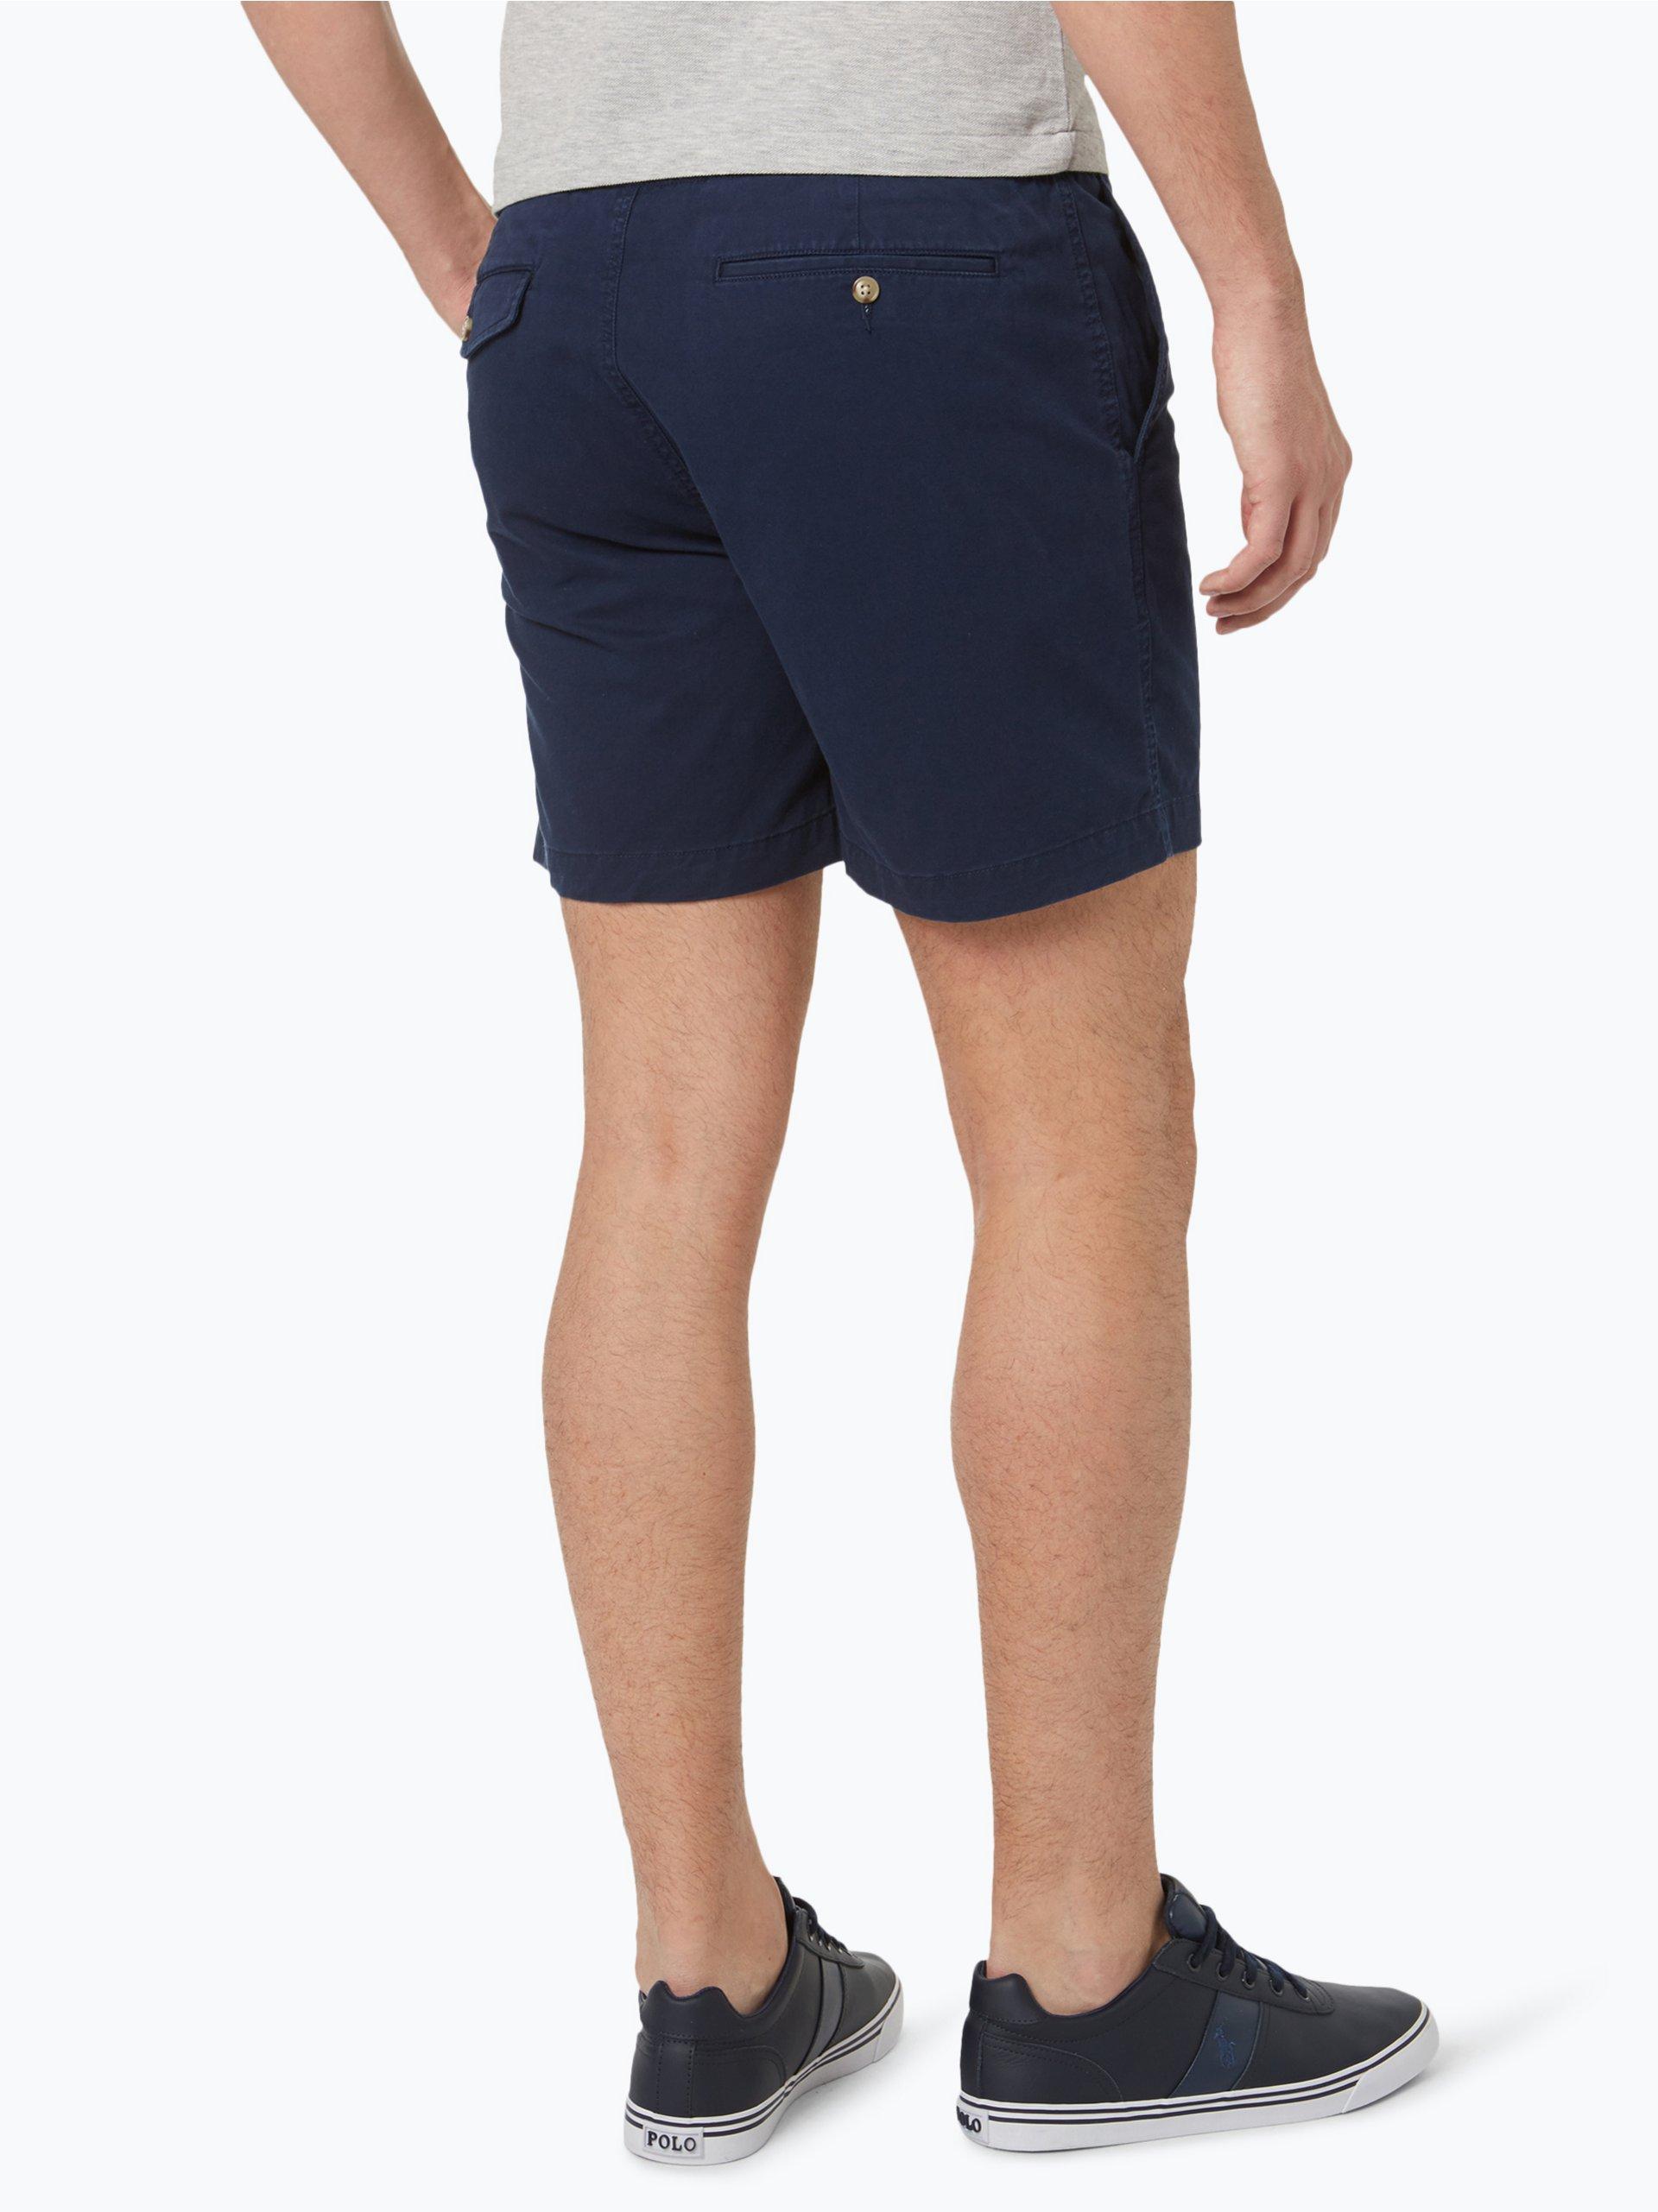 polo ralph lauren herren shorts 2 online kaufen peek und cloppenburg de. Black Bedroom Furniture Sets. Home Design Ideas